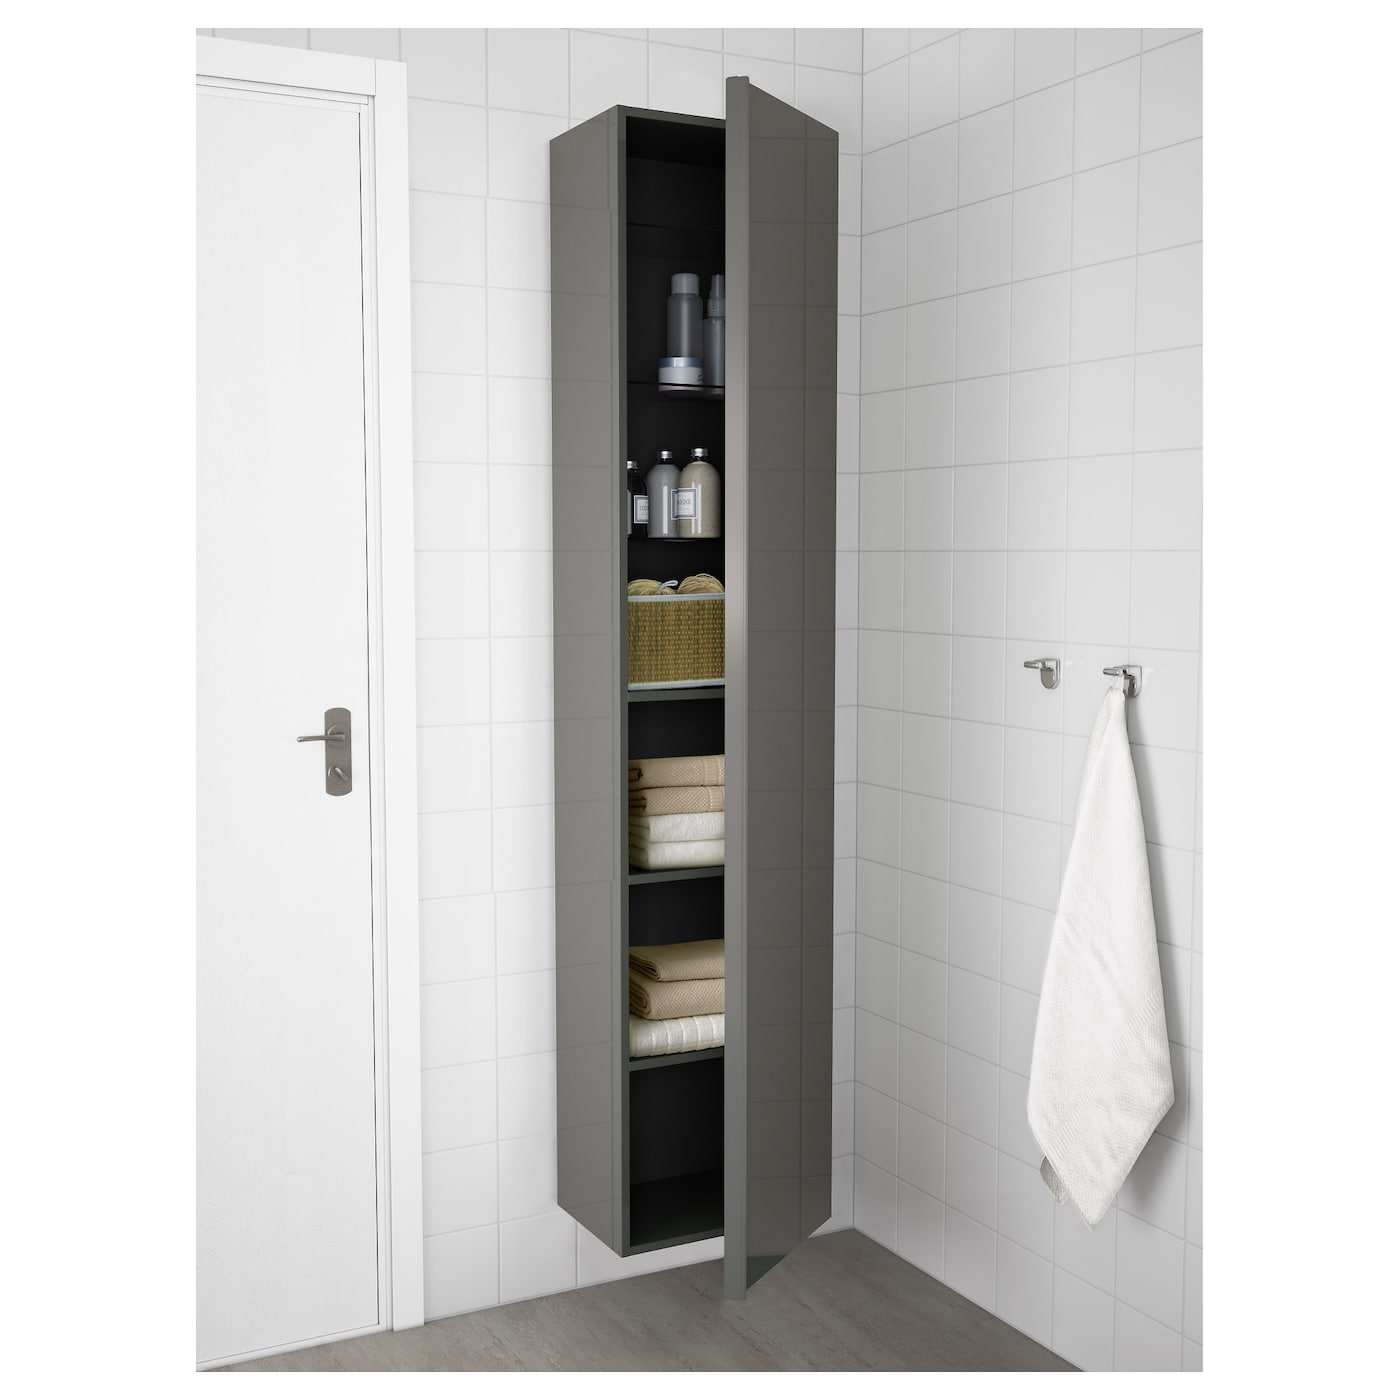 Morgon High Cabinet Gloss Gray